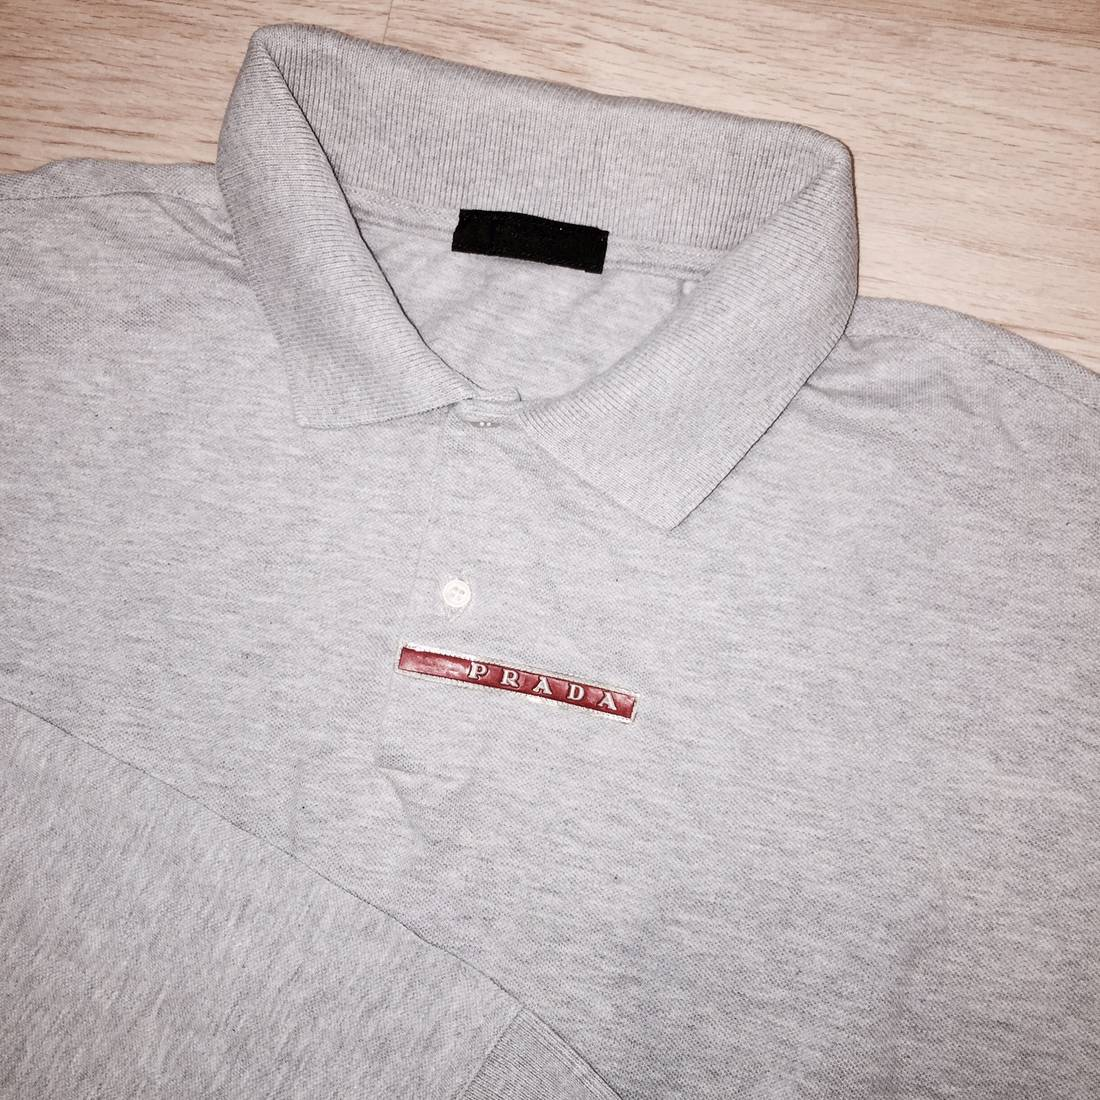 9d4aa7bb Prada Polo Shirt Red | RLDM